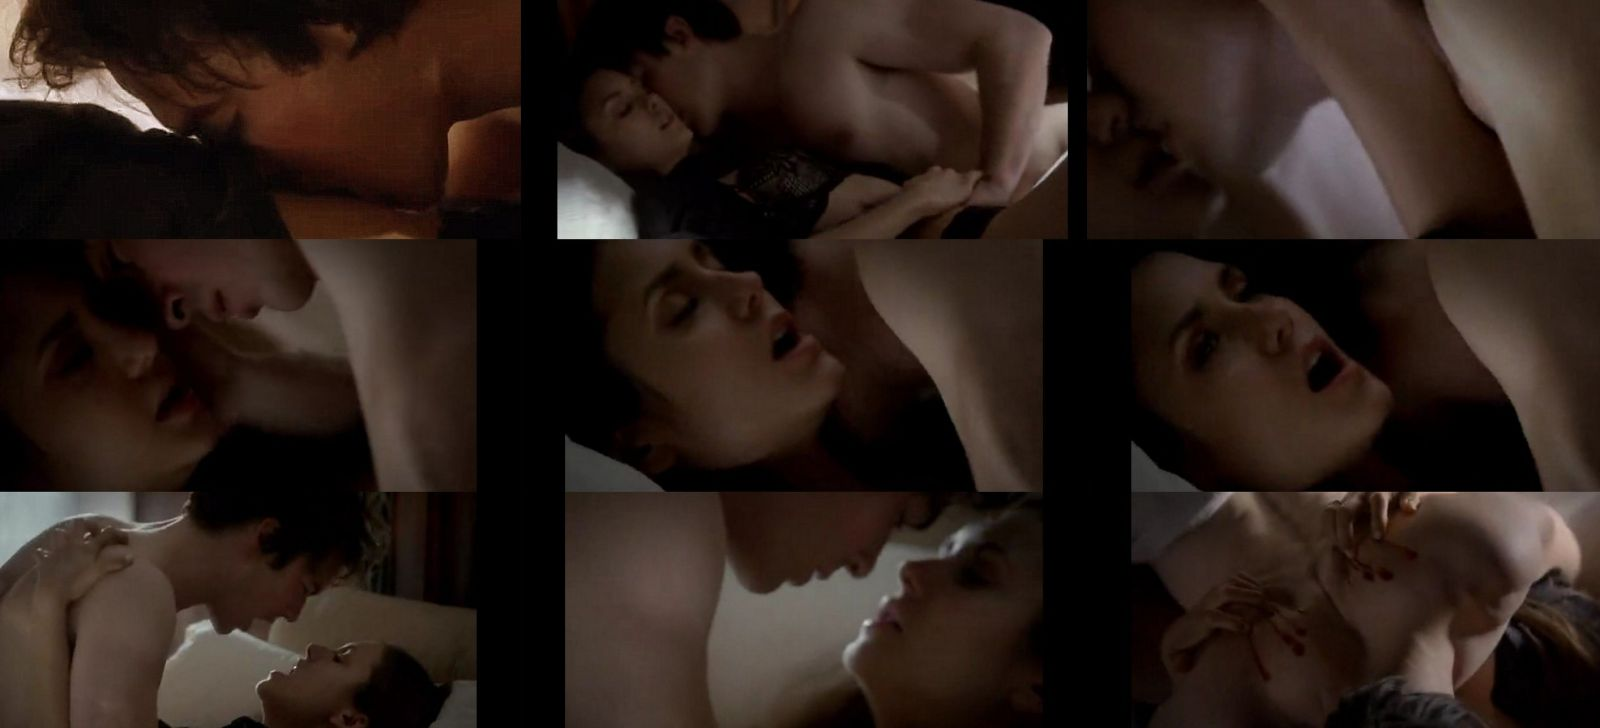 Секс с вампиром фото